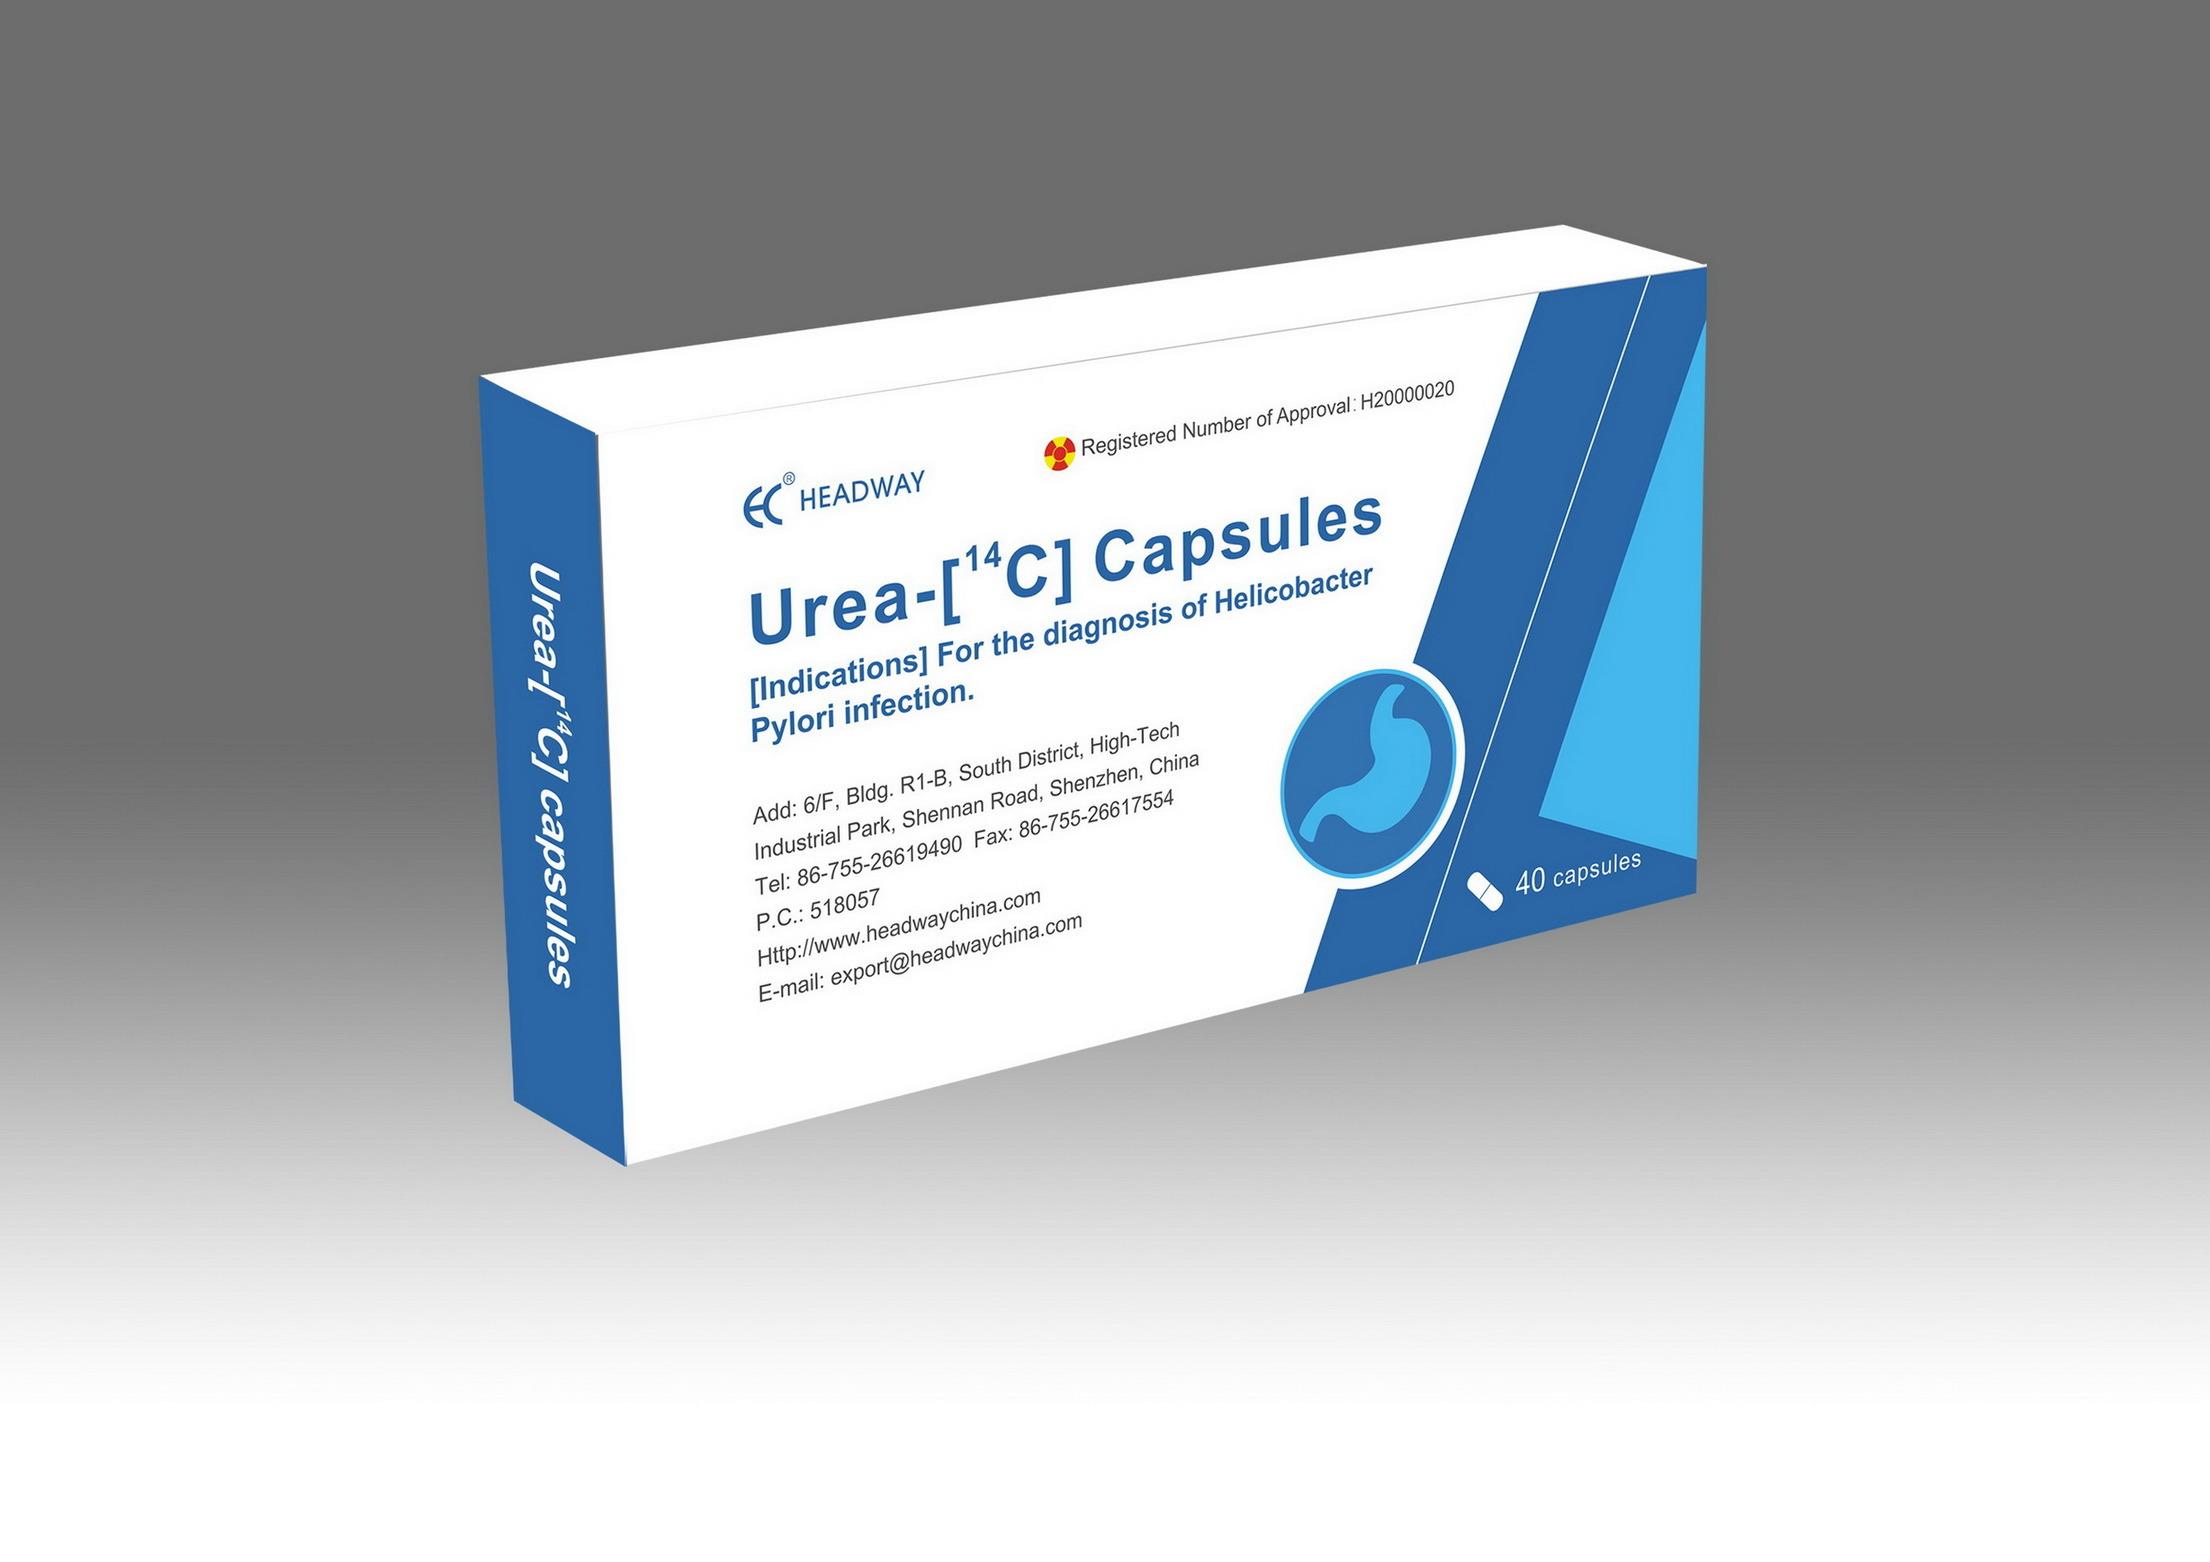 Helicobacter Pylori (H. pylori) Rapid Breath Test Kit